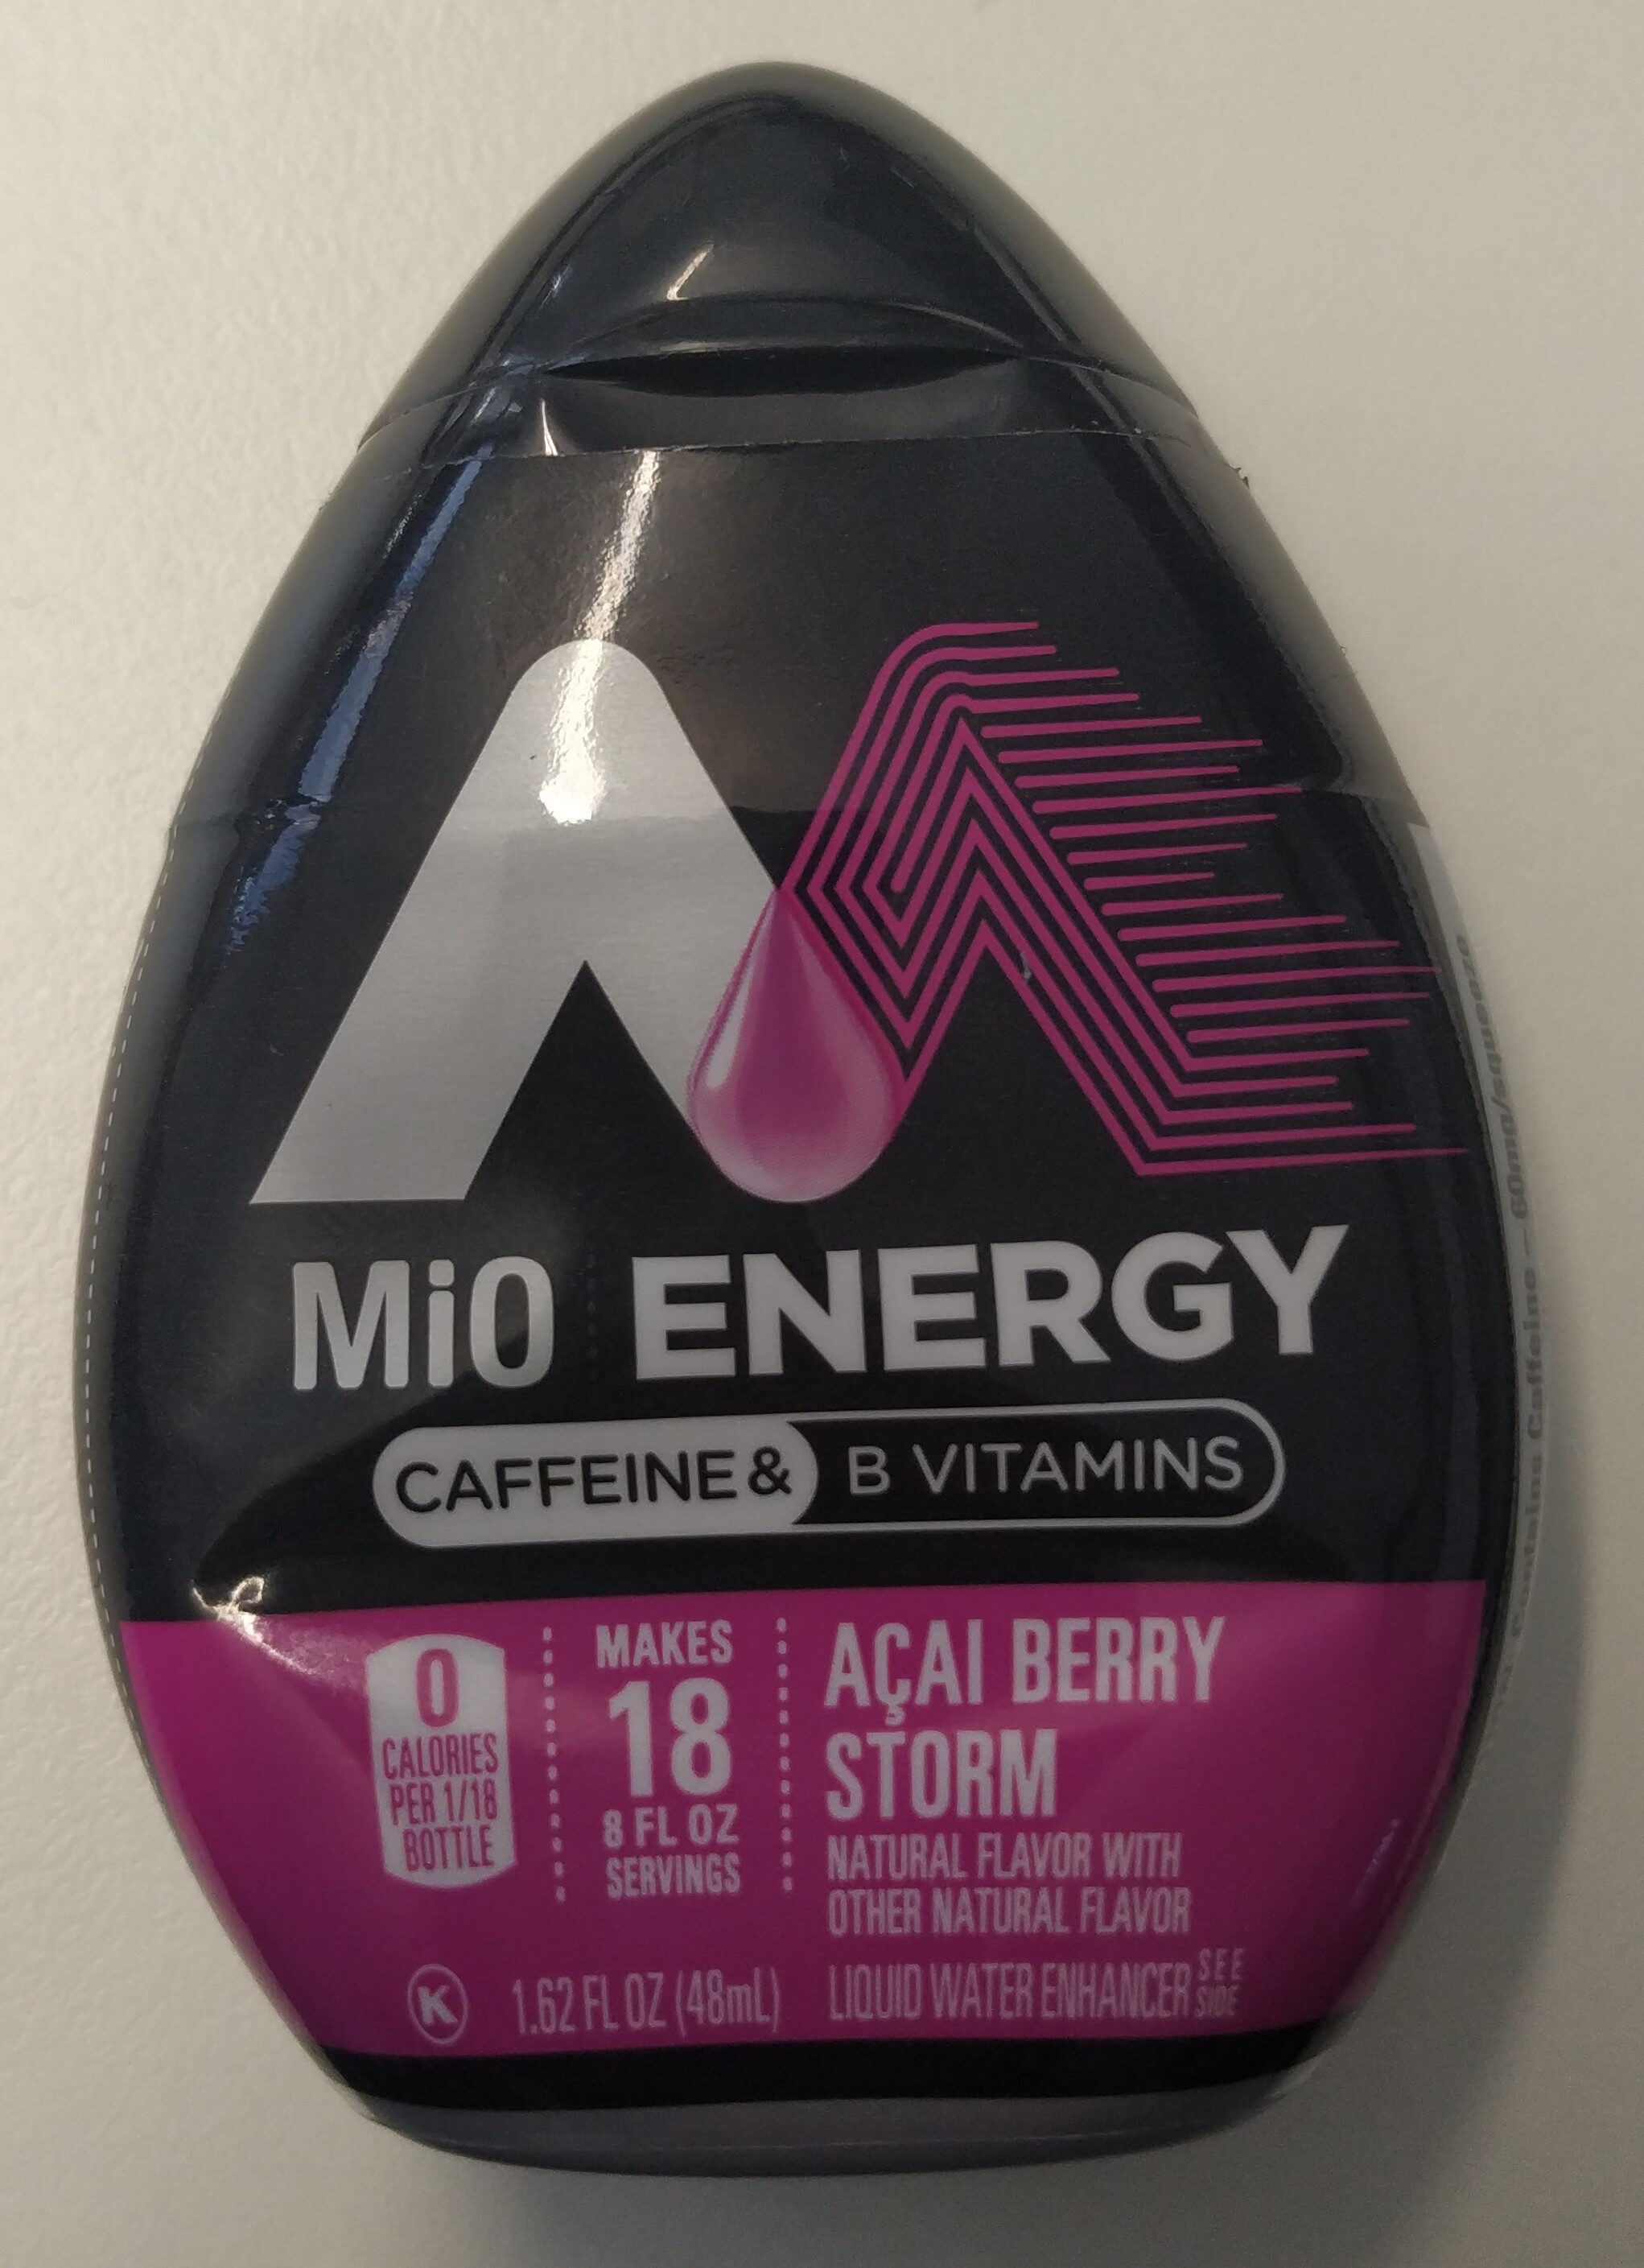 Energy Liquid Water Enhancer, Acai, Berry Storm - Product